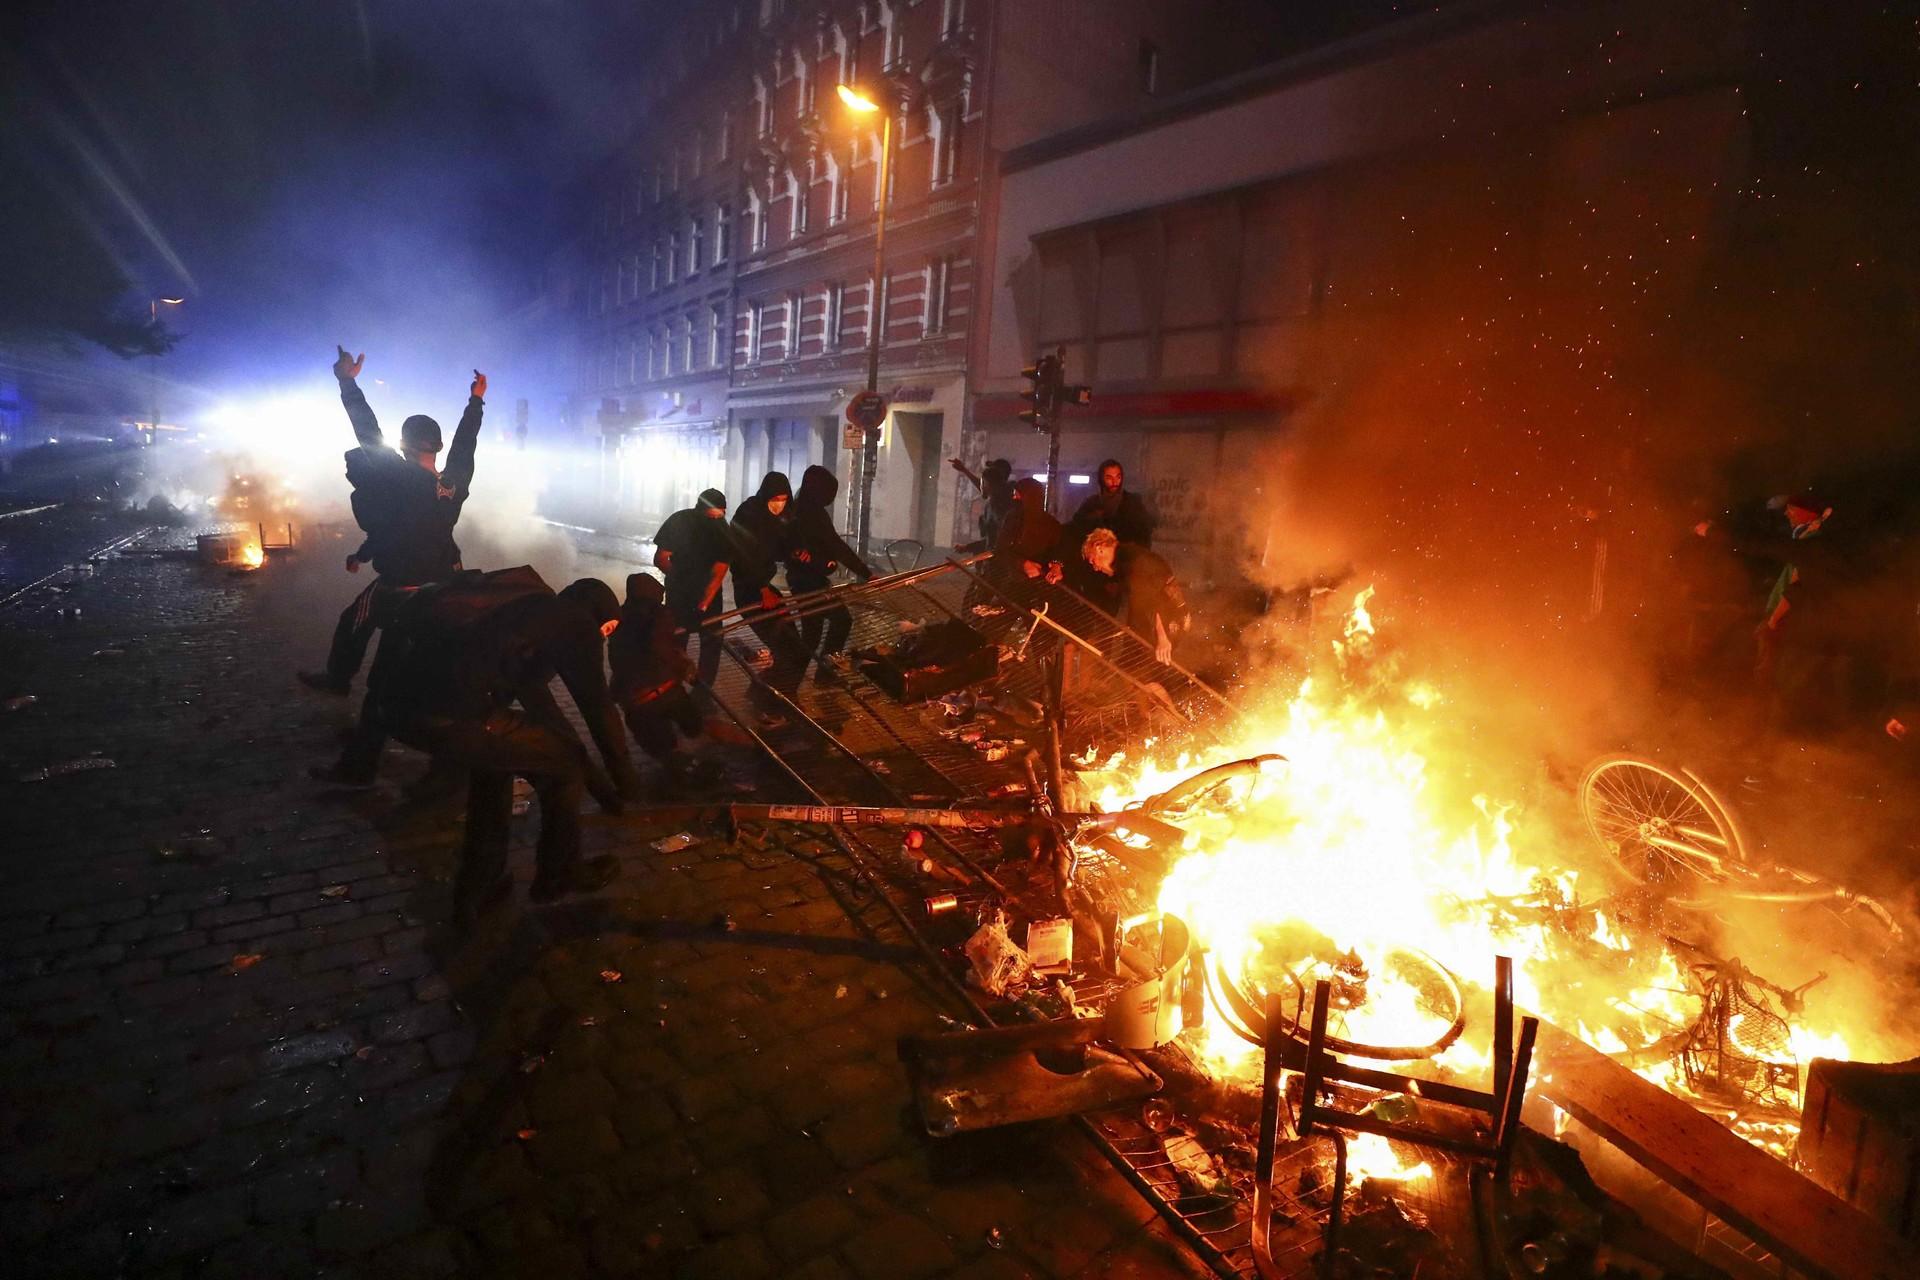 Barricate in fiamme Amburgo G20